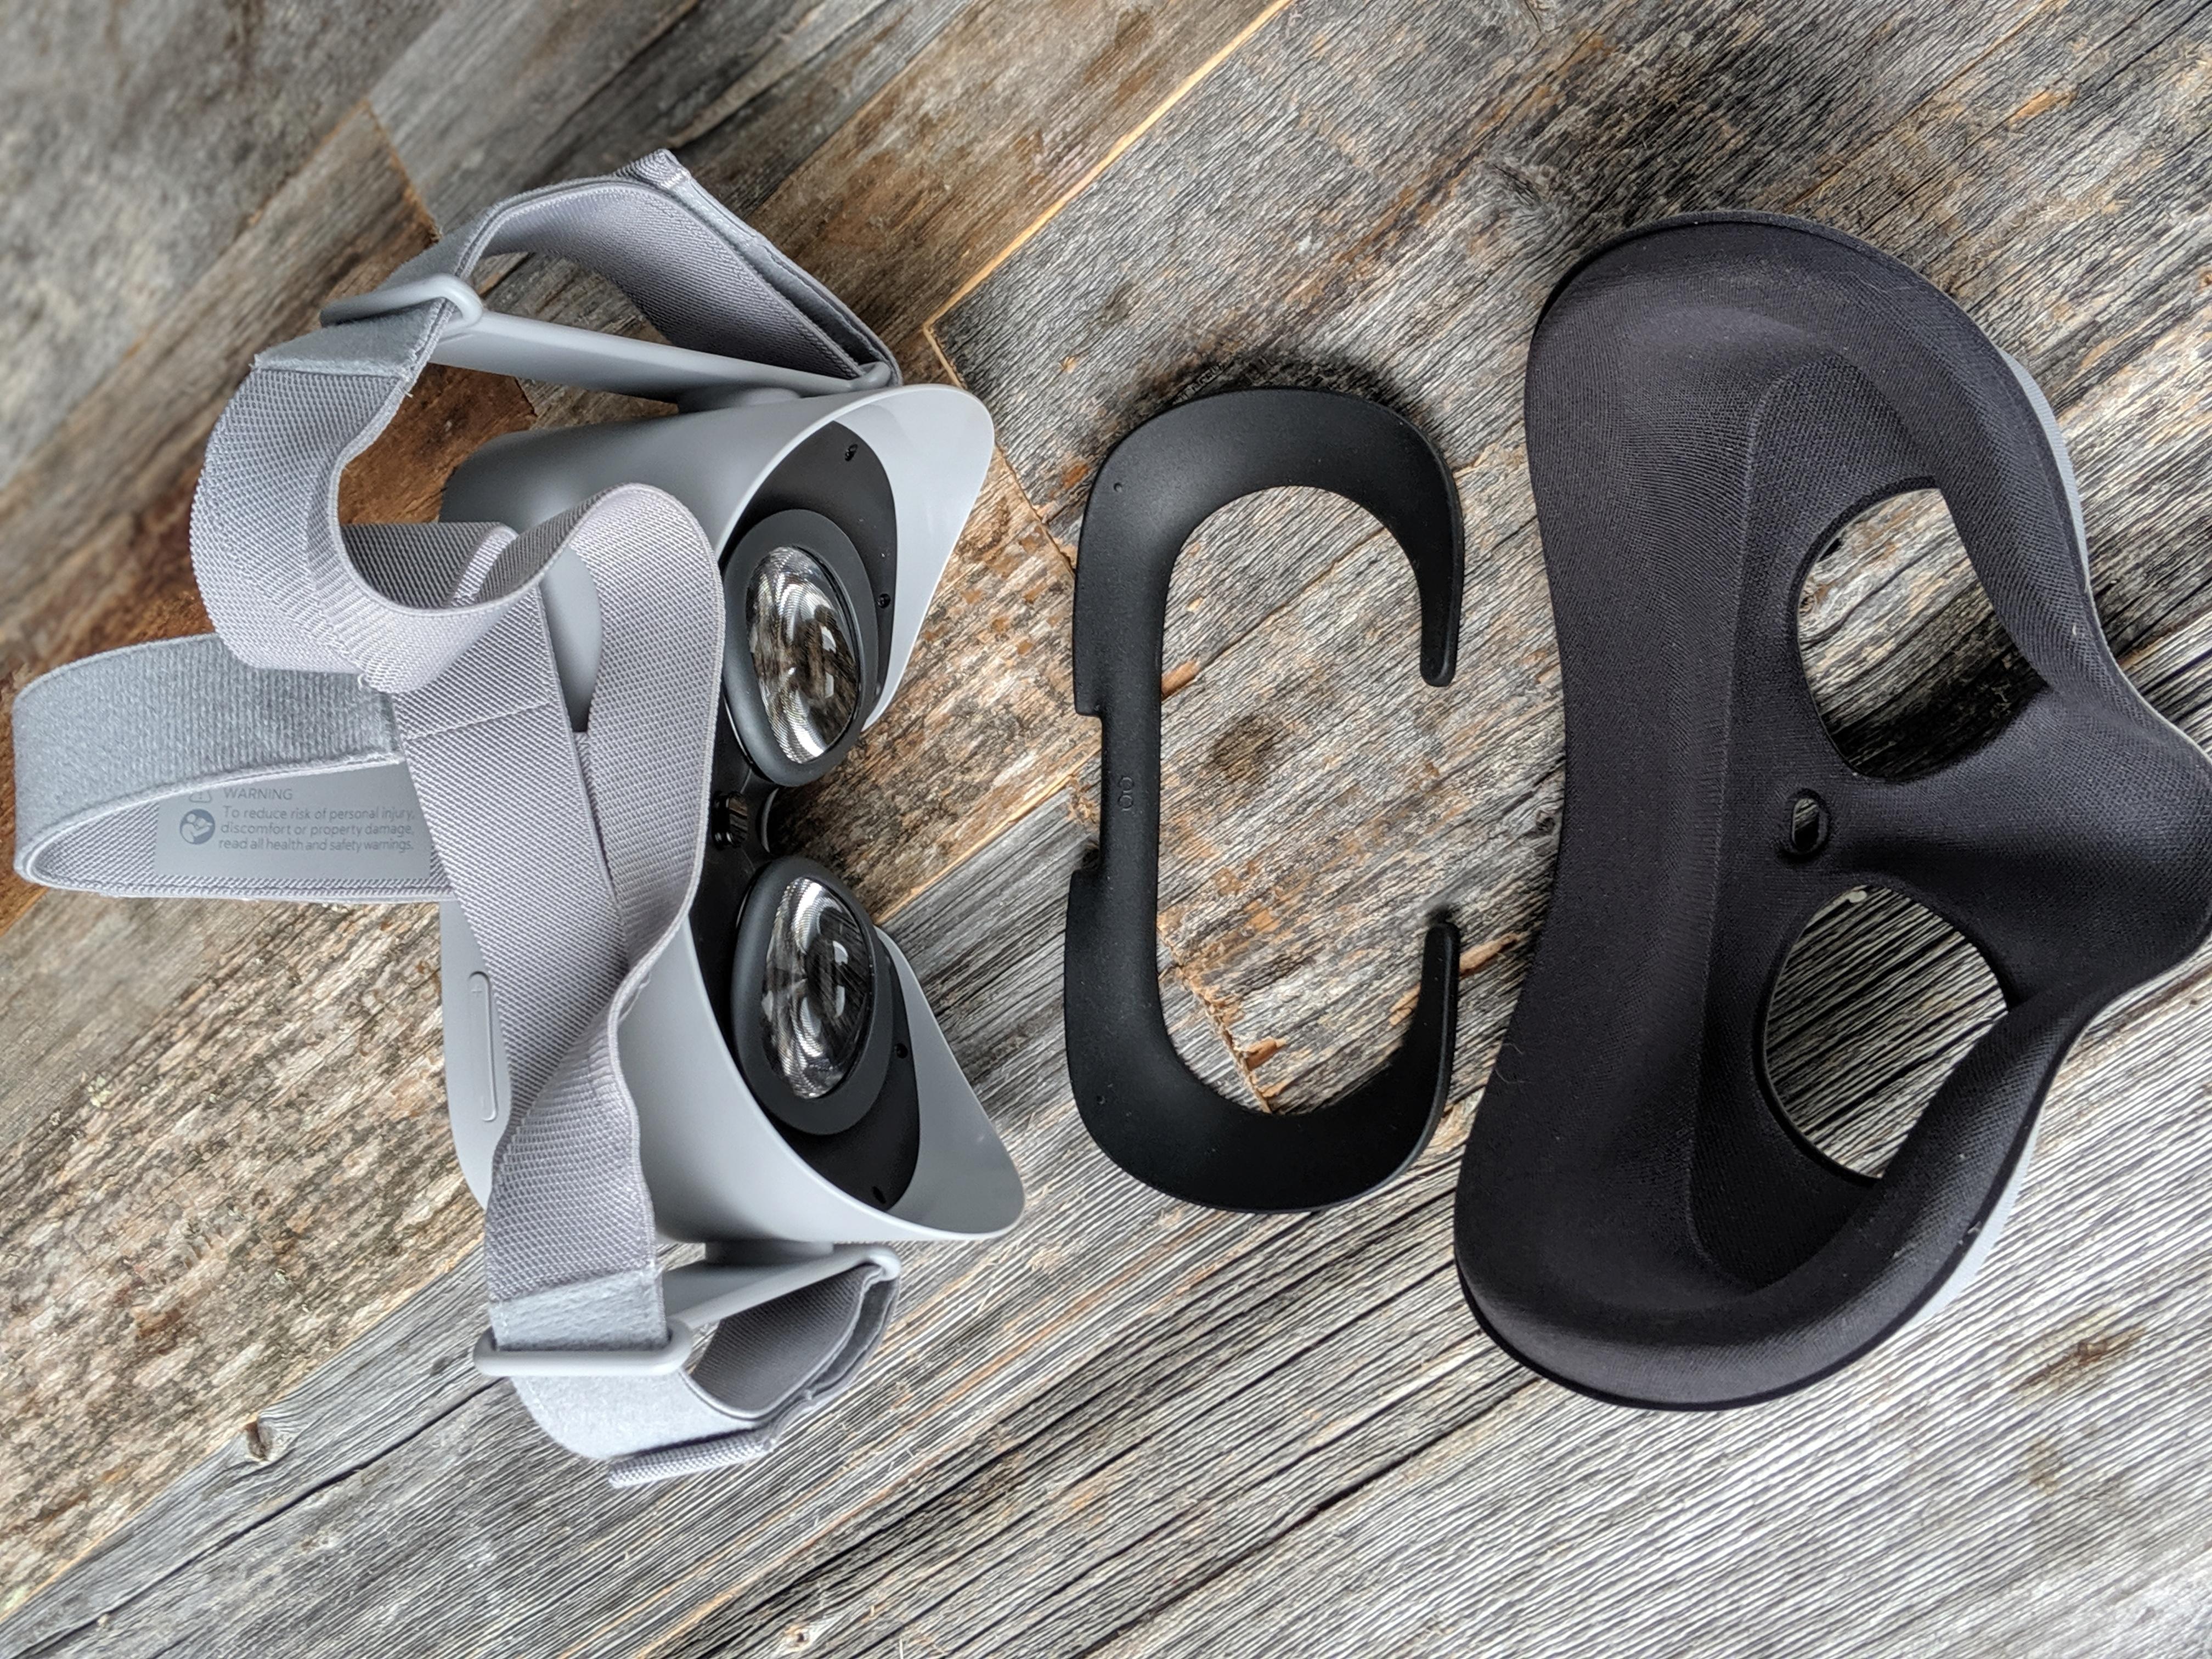 oculus Go - Headset components